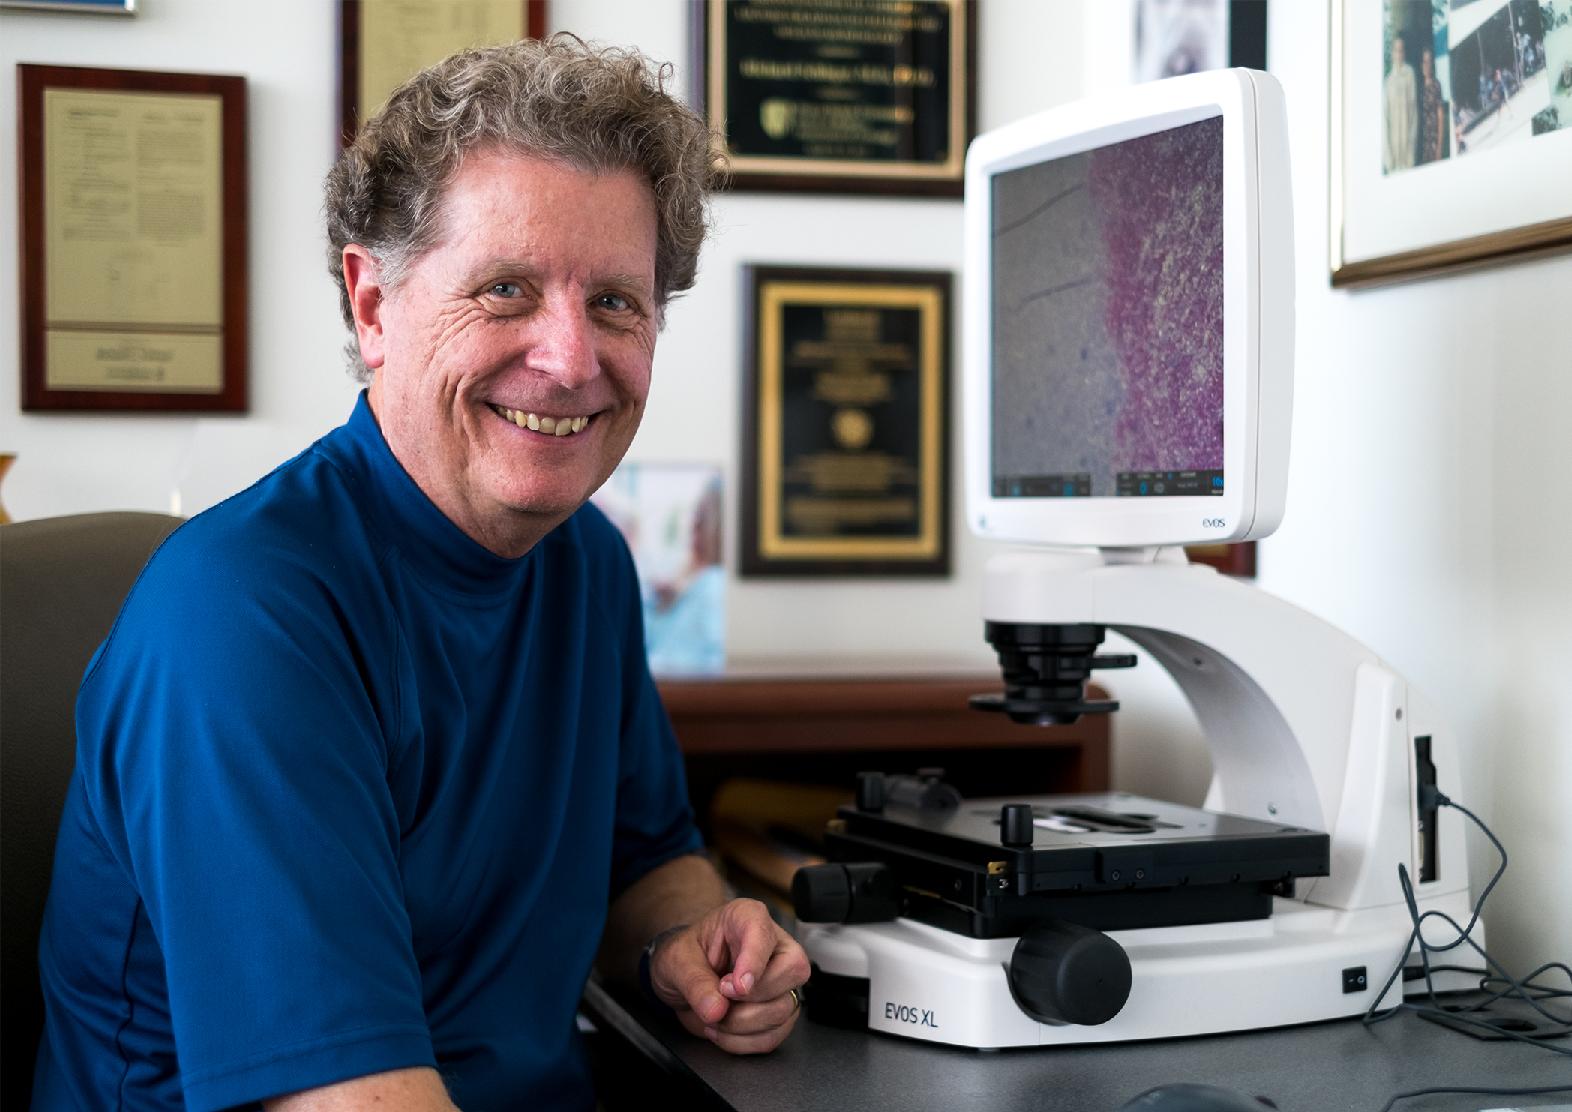 Dr. Richard Schlegel in his office